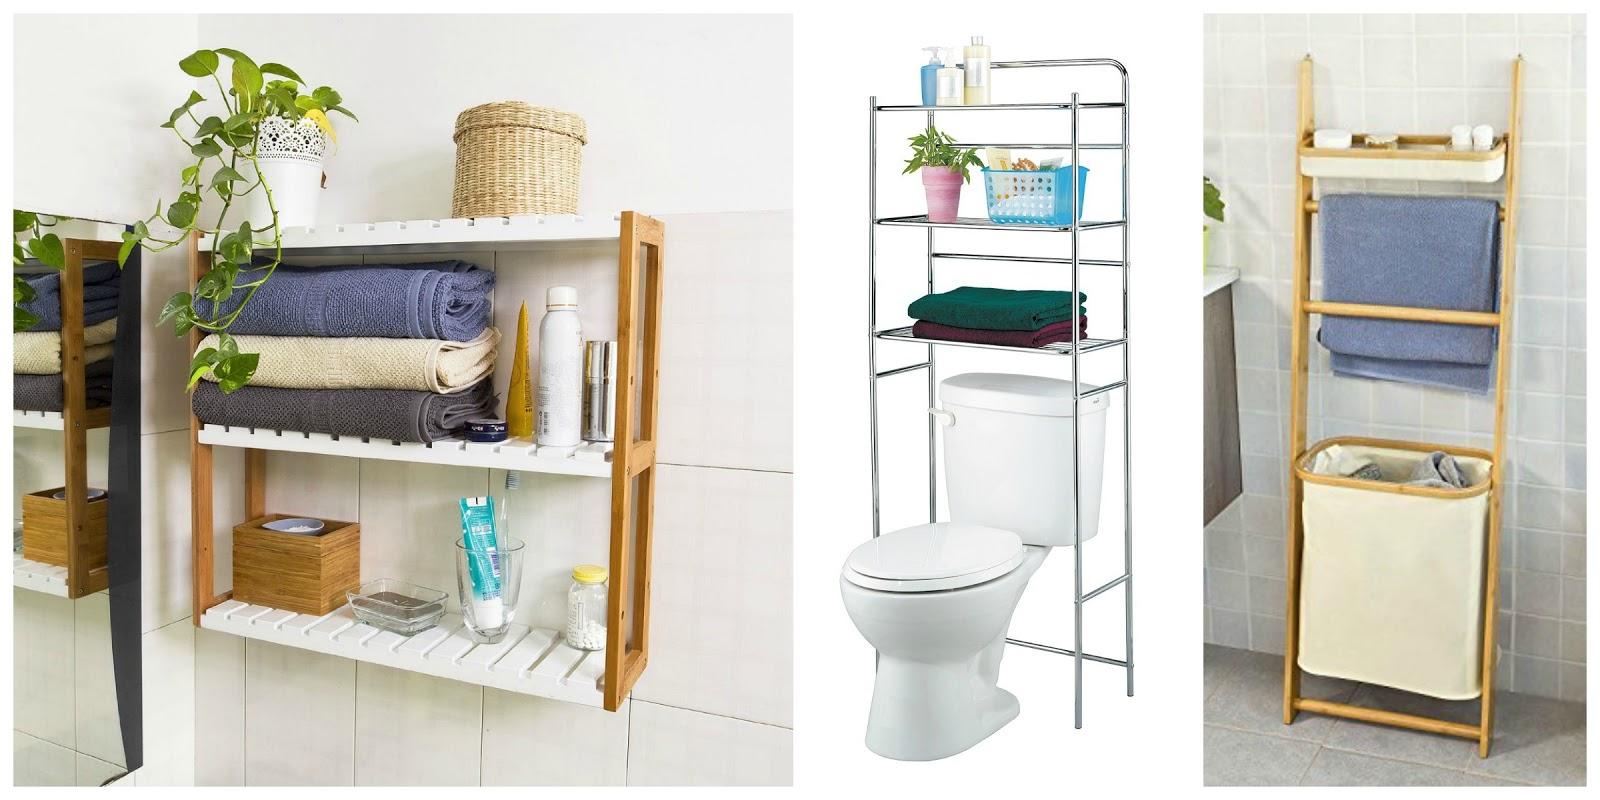 Idee mobili bagno fai da te ko37 pineglen - Idee mobili bagno ...